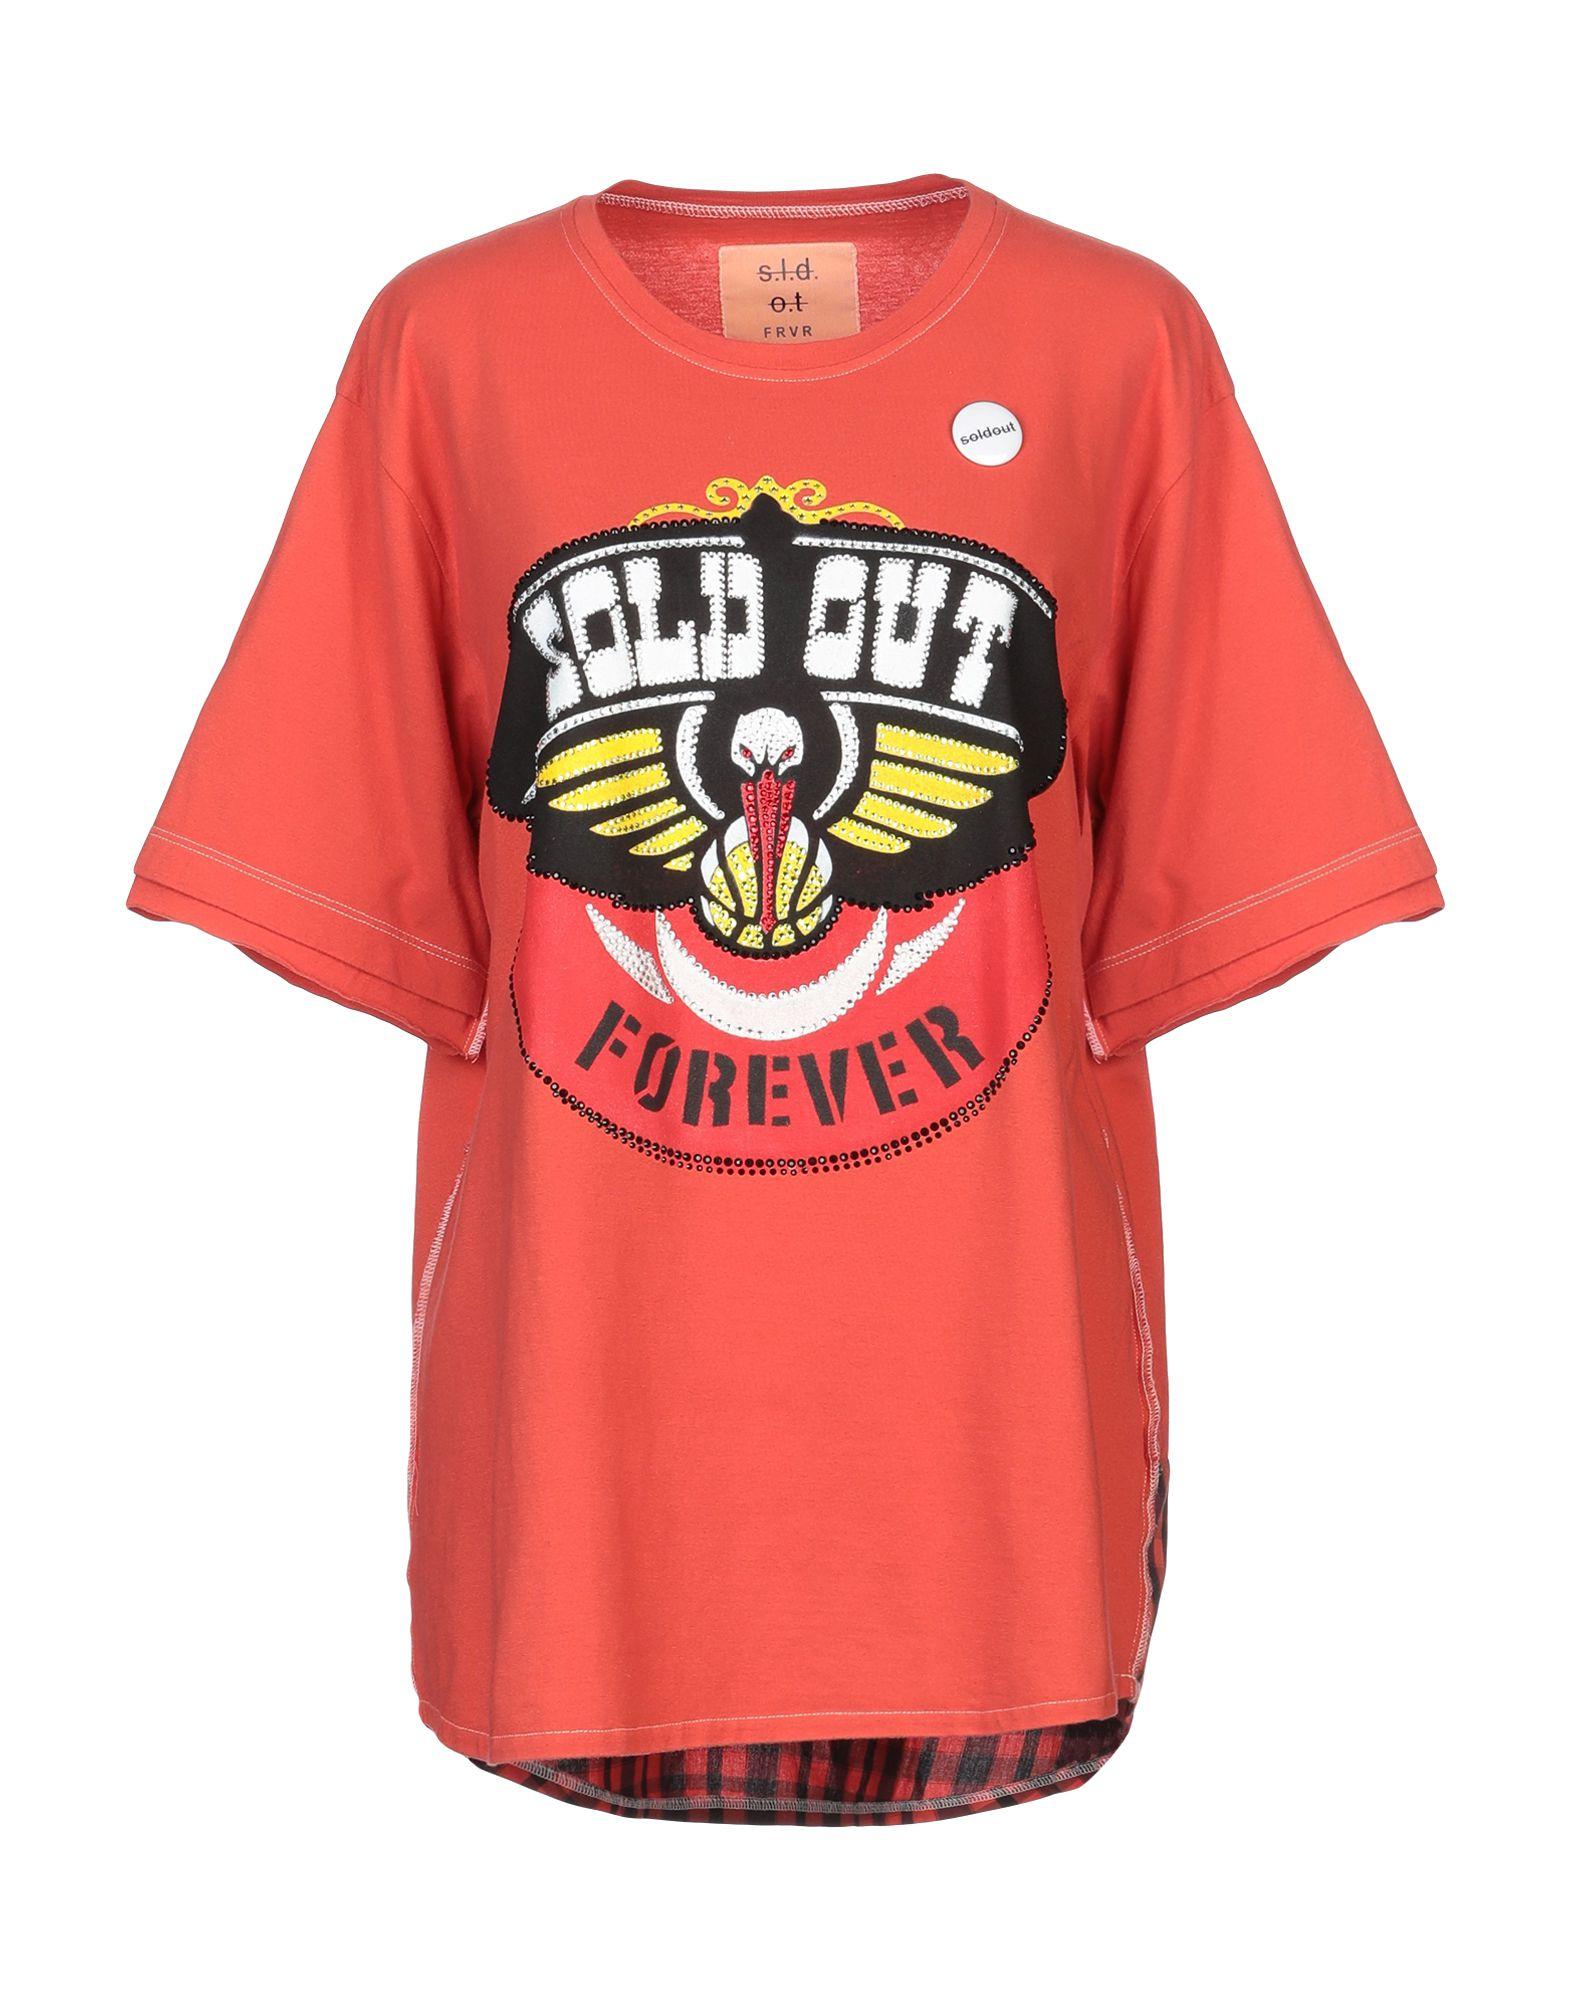 T-Shirt Sold Out Out donna - 12279865DP  kosteneffizient